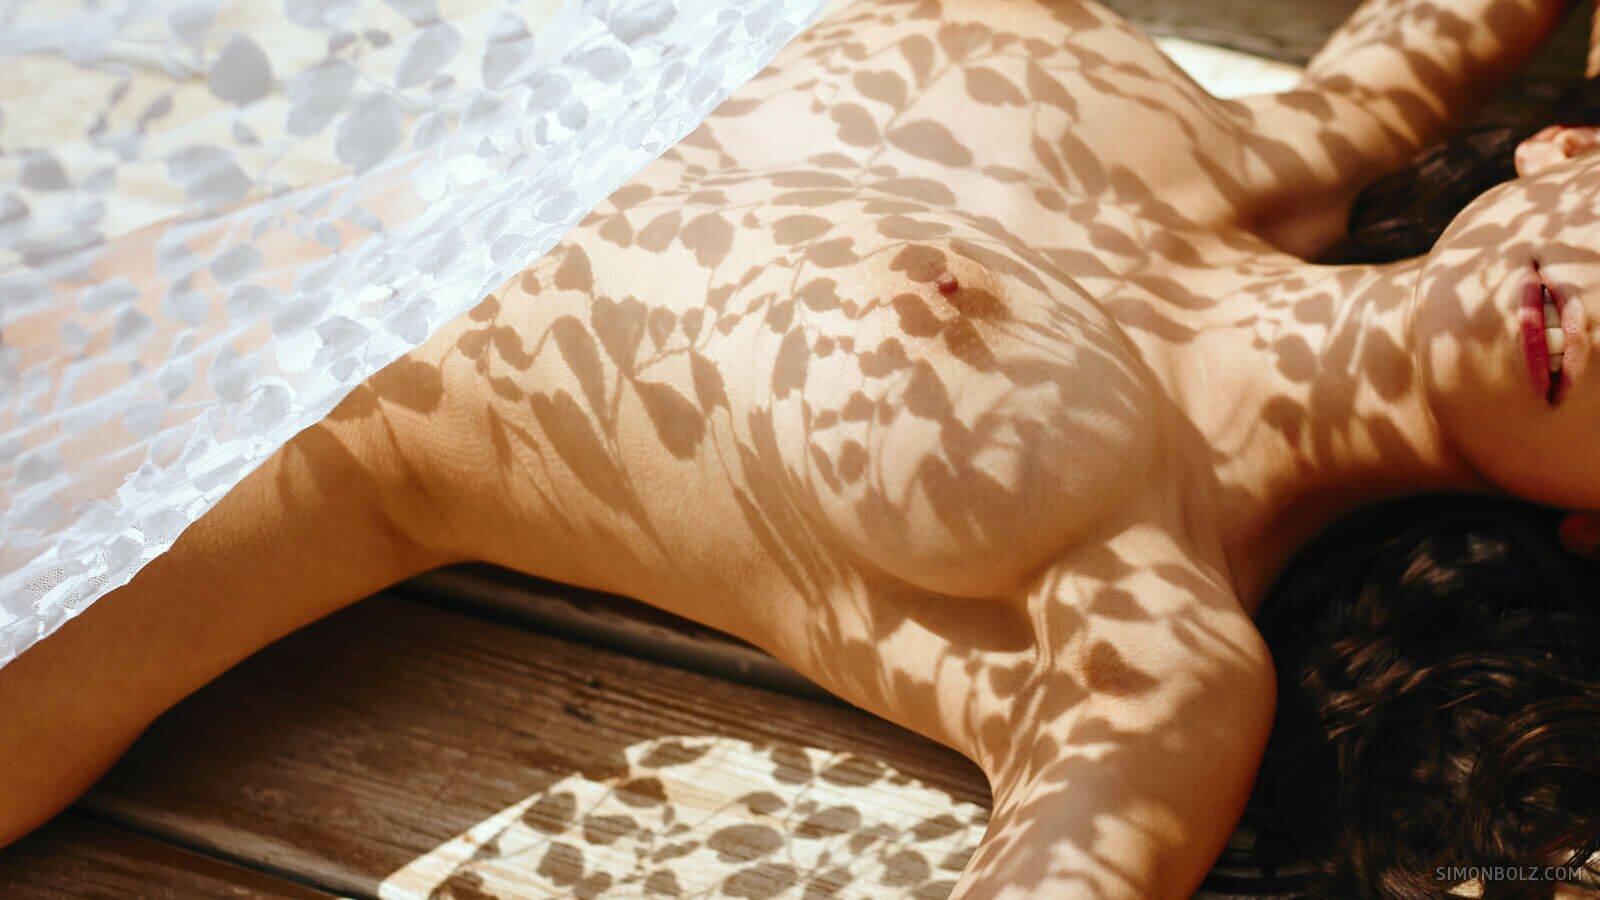 Cleavage Ana Lorde nude (77 photos), Tits, Sideboobs, Twitter, cleavage 2015